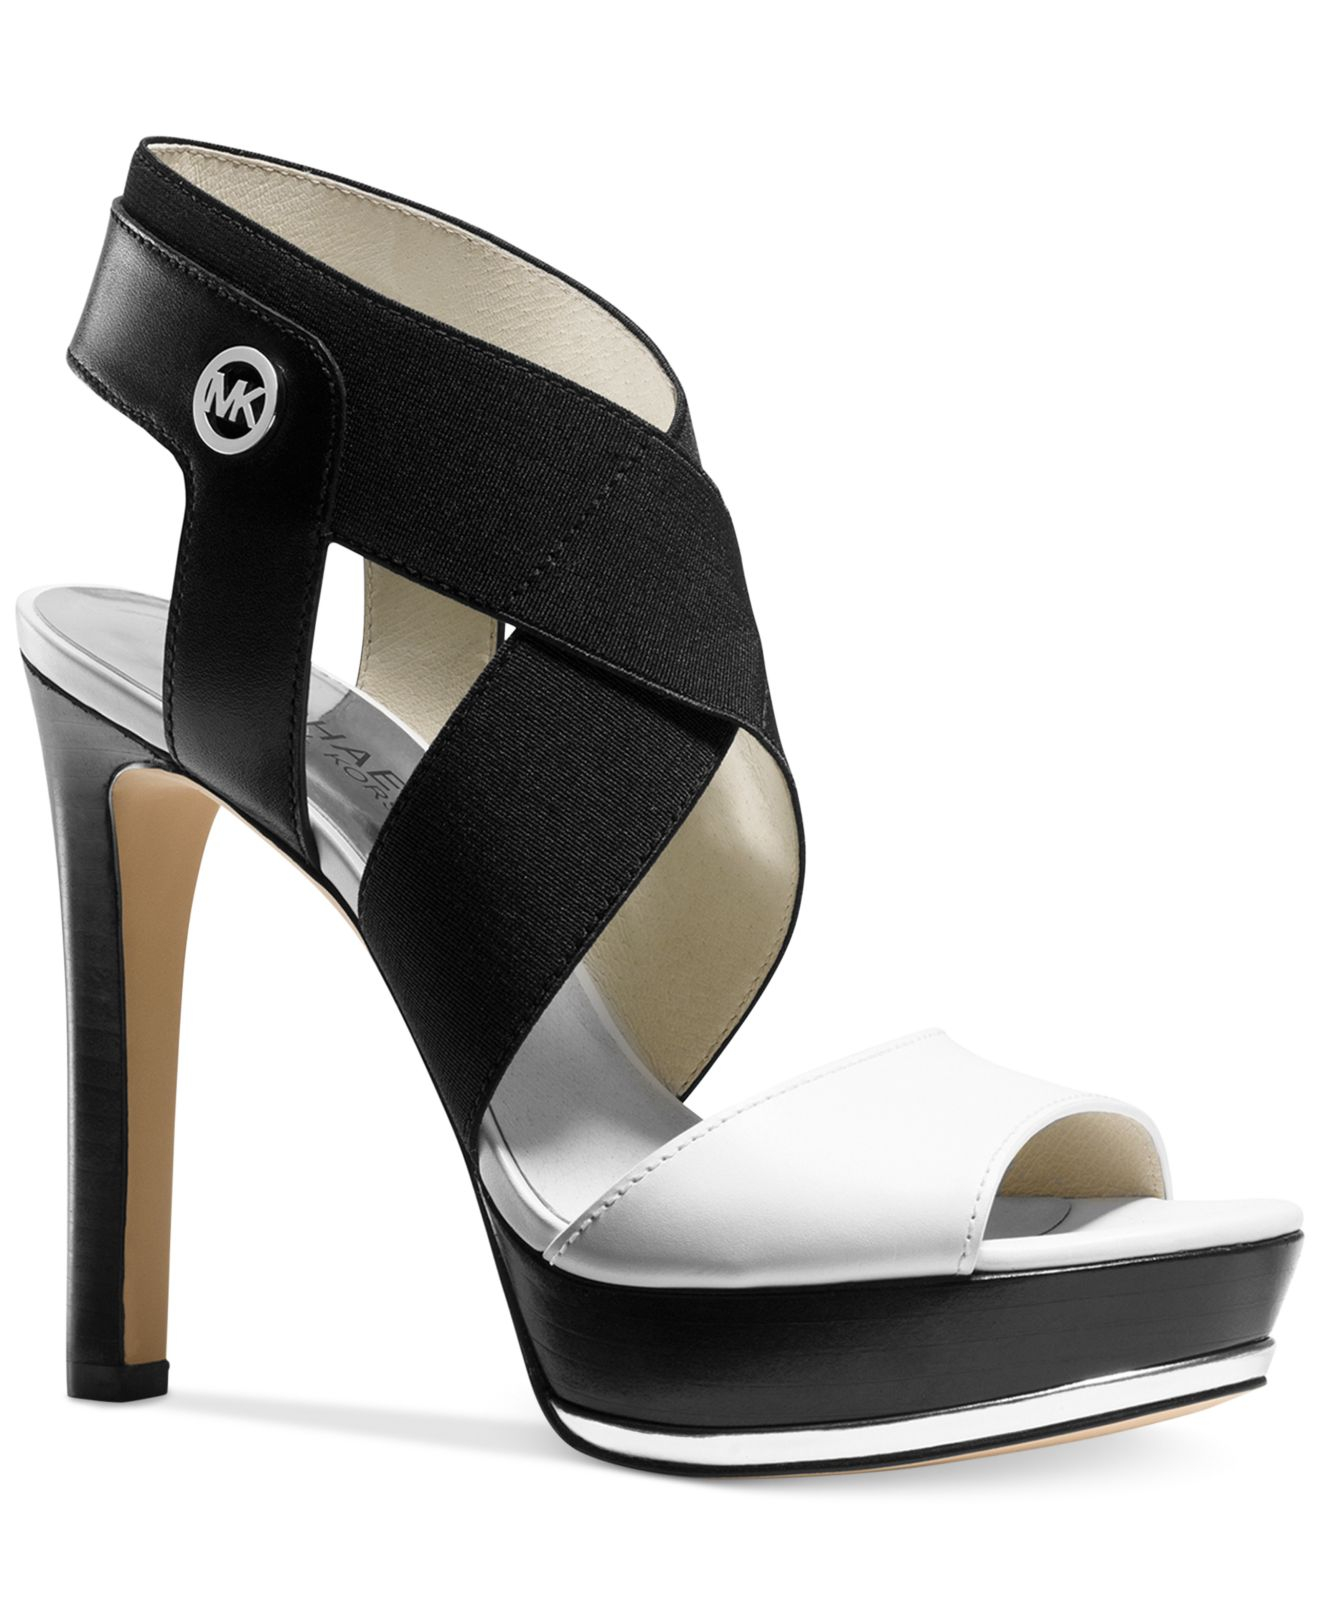 b2053e74ff09 Lyst - Michael Kors Michael Meadow Platform Sandals in White